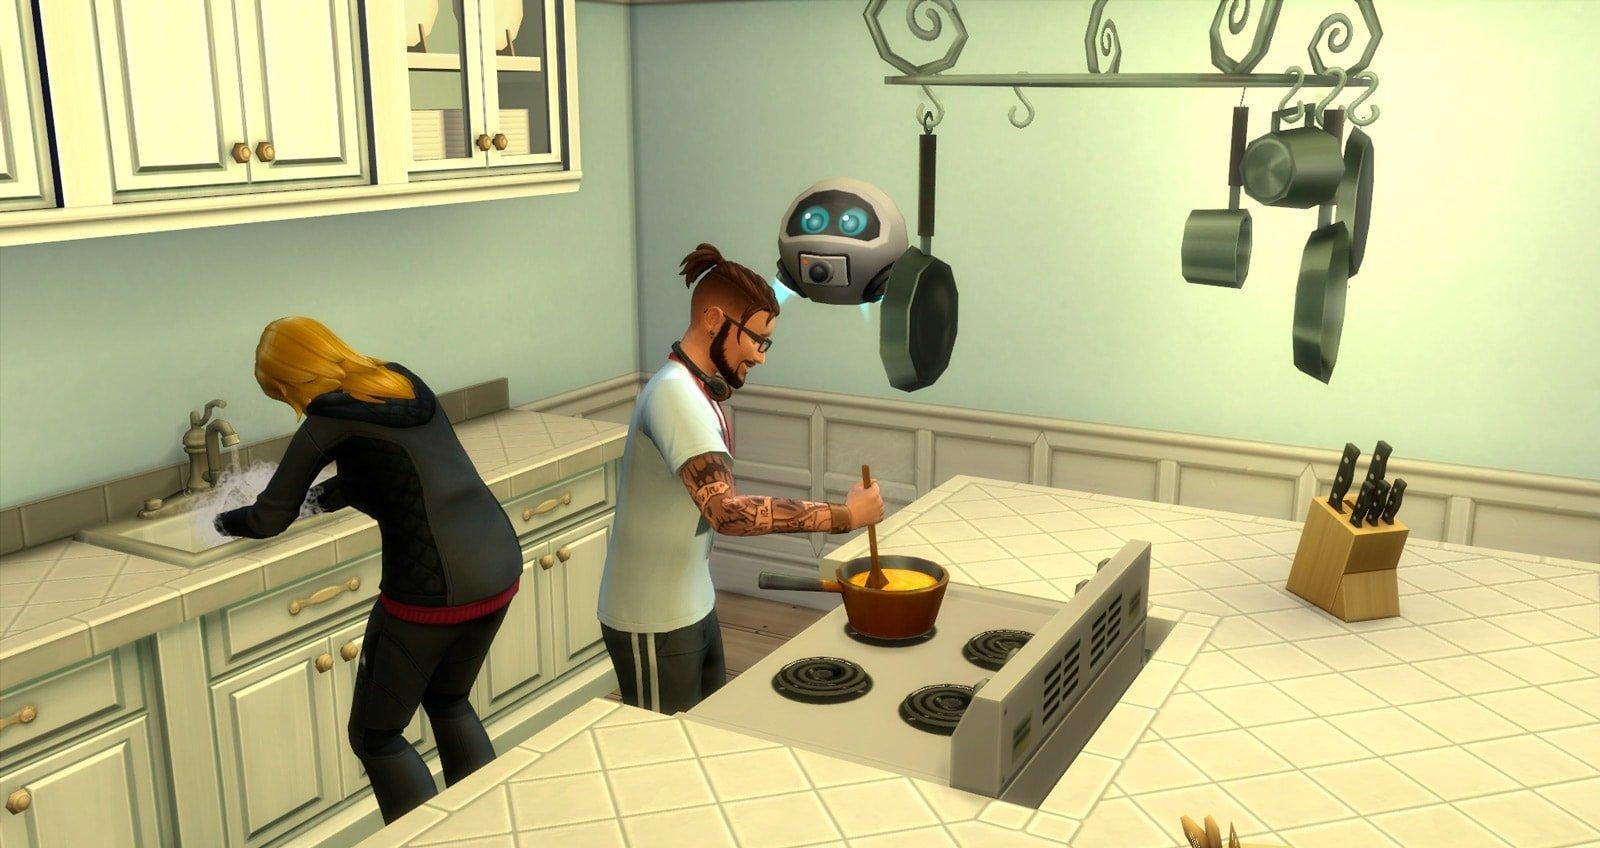 Путь к славе Sims 4. навык блогер